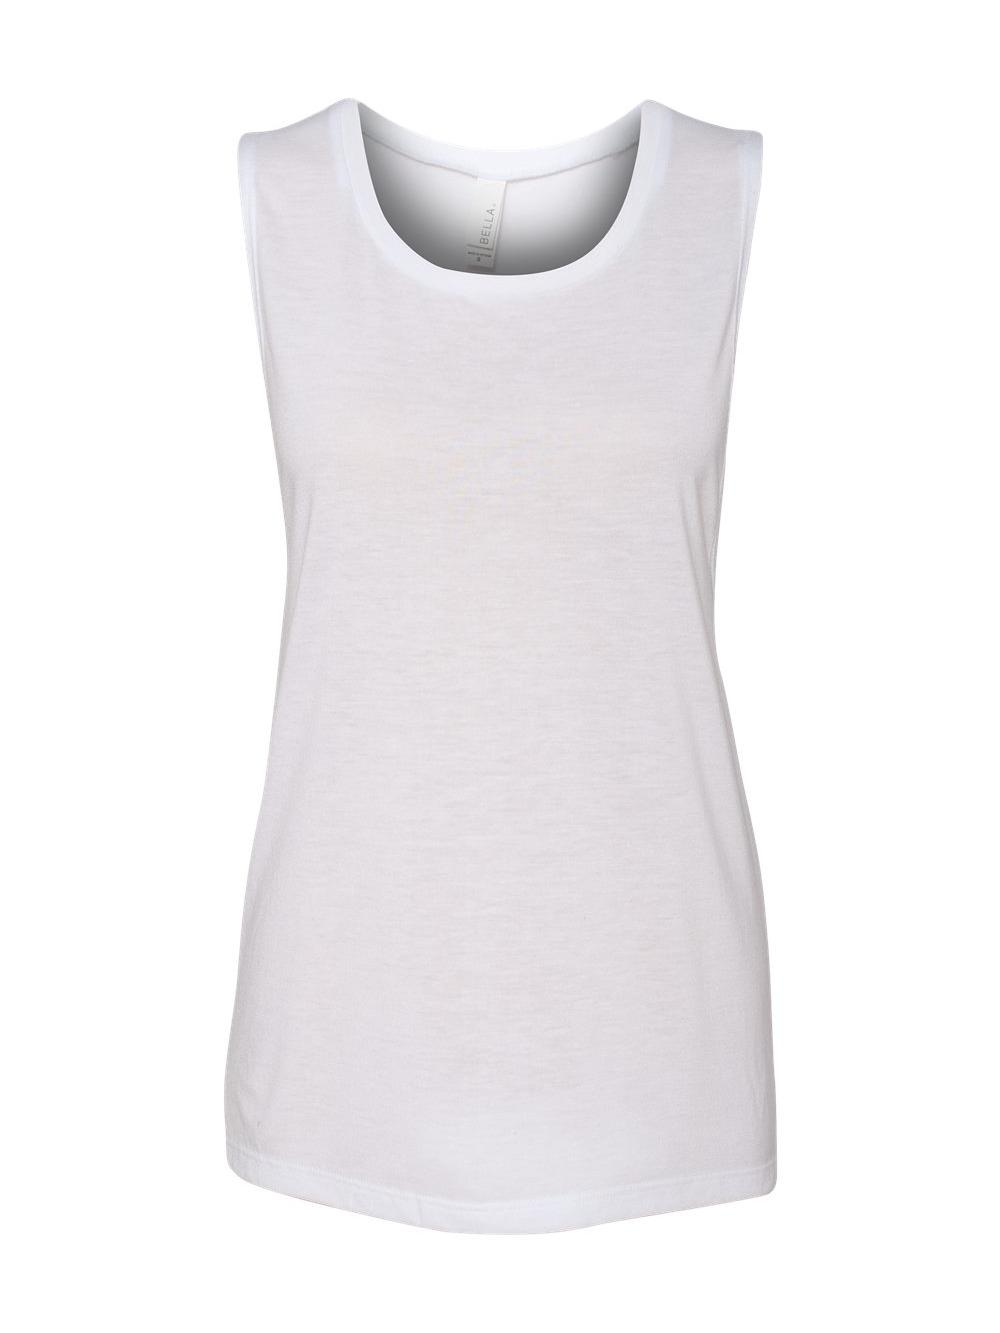 a41cb0d5084395 Bella Canvas Flowy Muscle Tank Tops Sleeveless Shirts 8803 White X ...